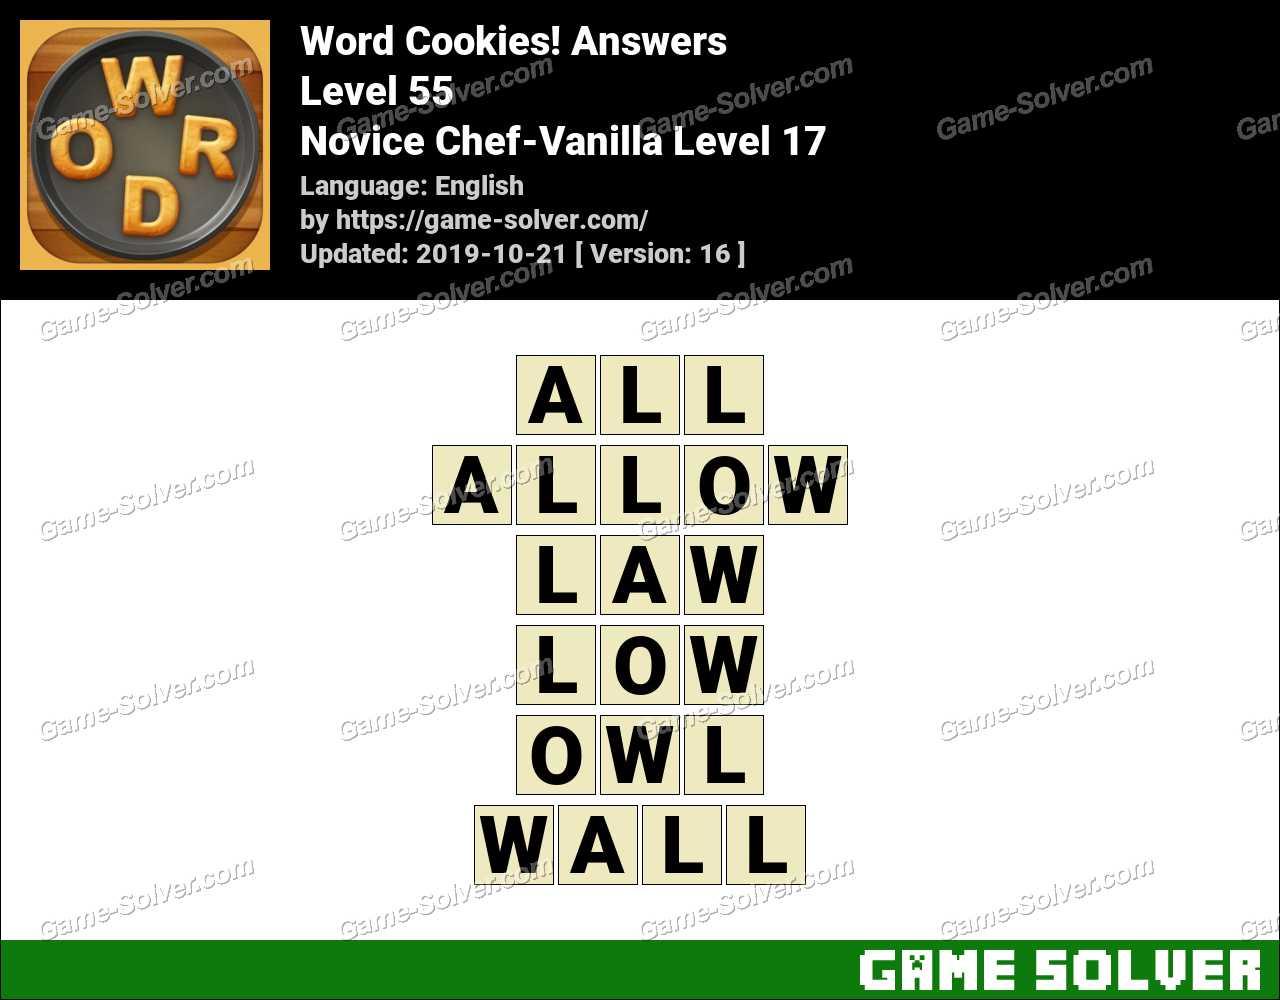 Word Cookies Novice Chef-Vanilla Level 17 Answers